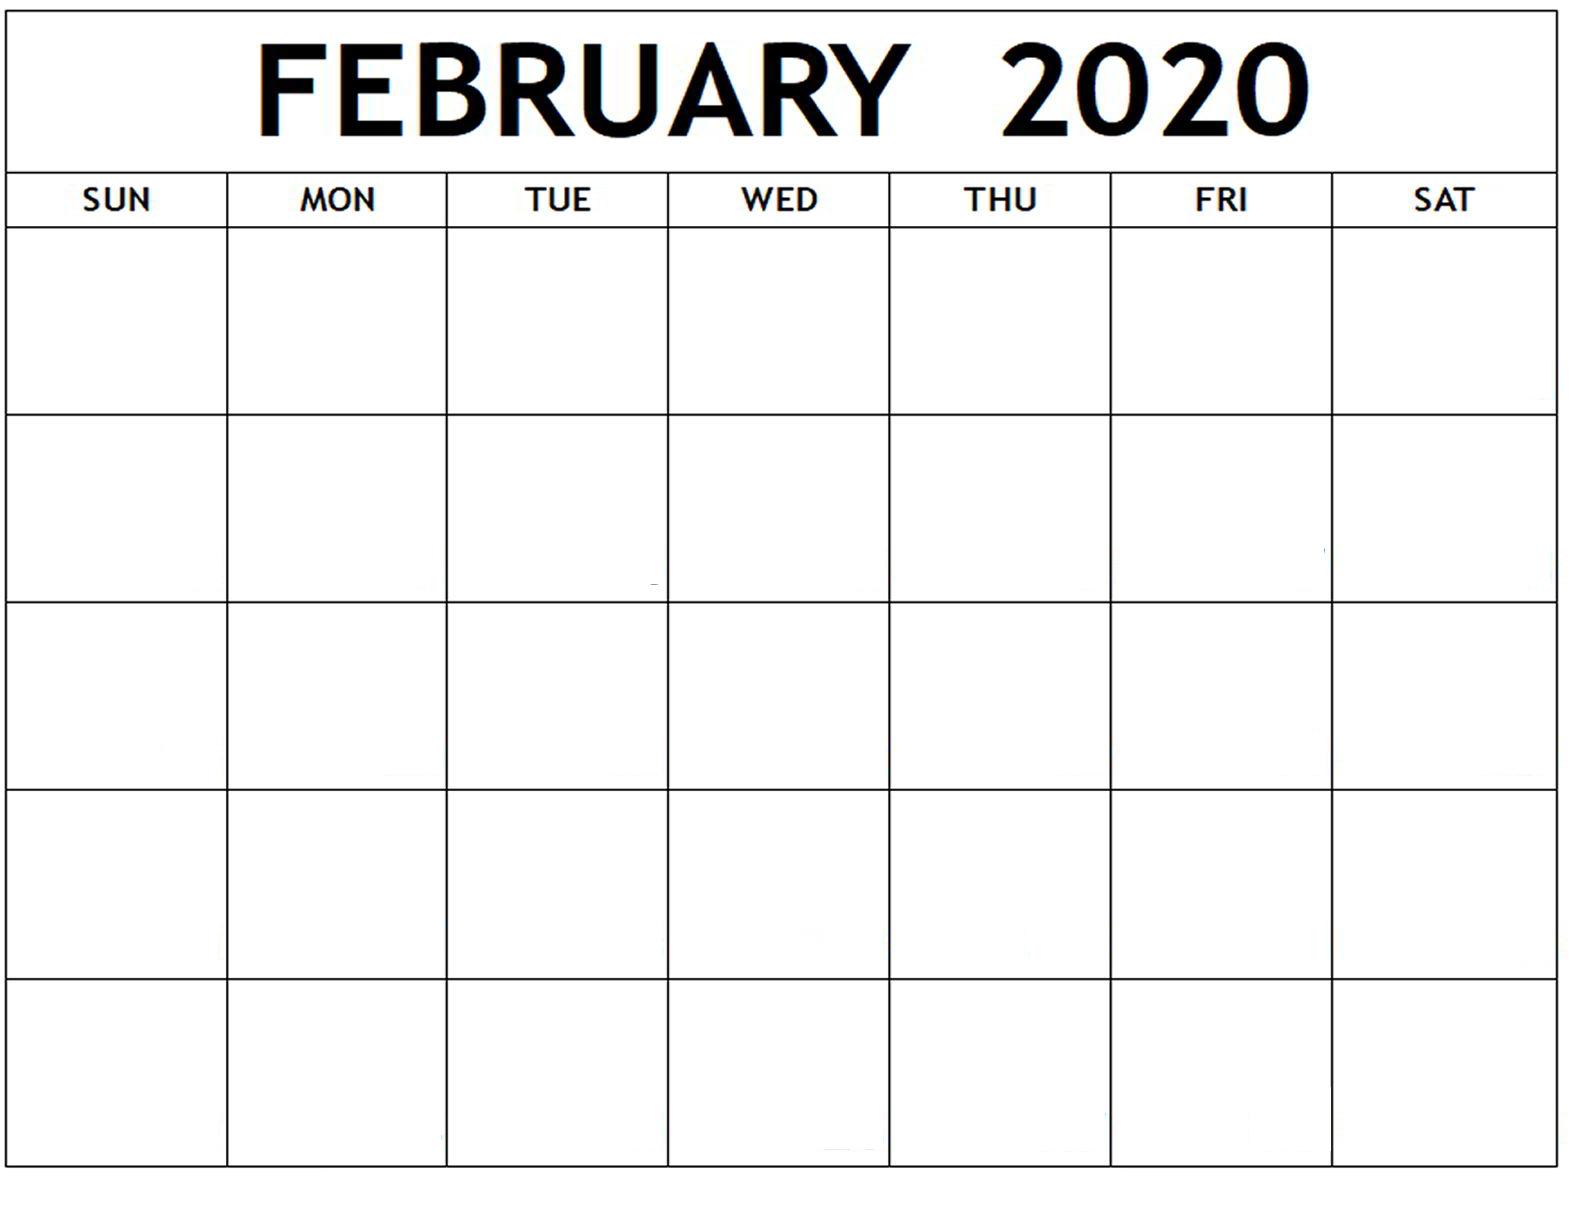 Blank February 2020 Calendar – Manage Work Activities | 12